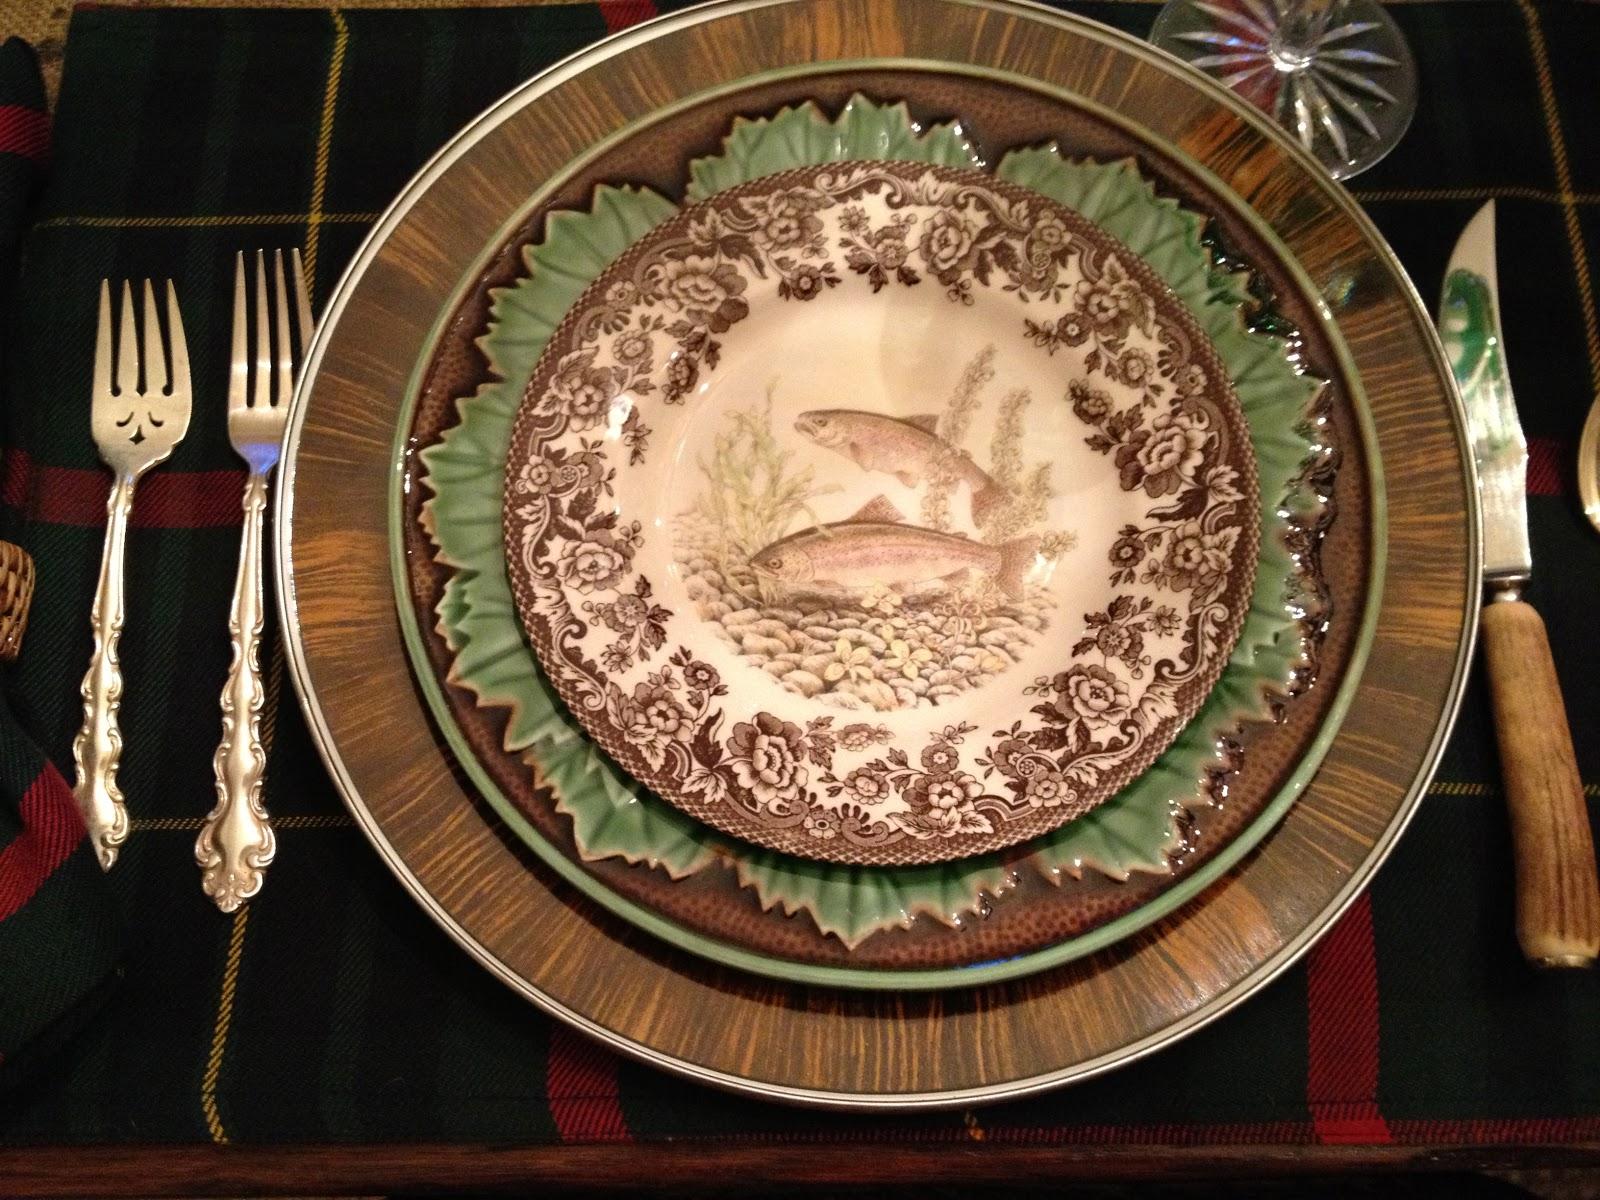 vignette design: A Fisherman's Dinner Tablescape